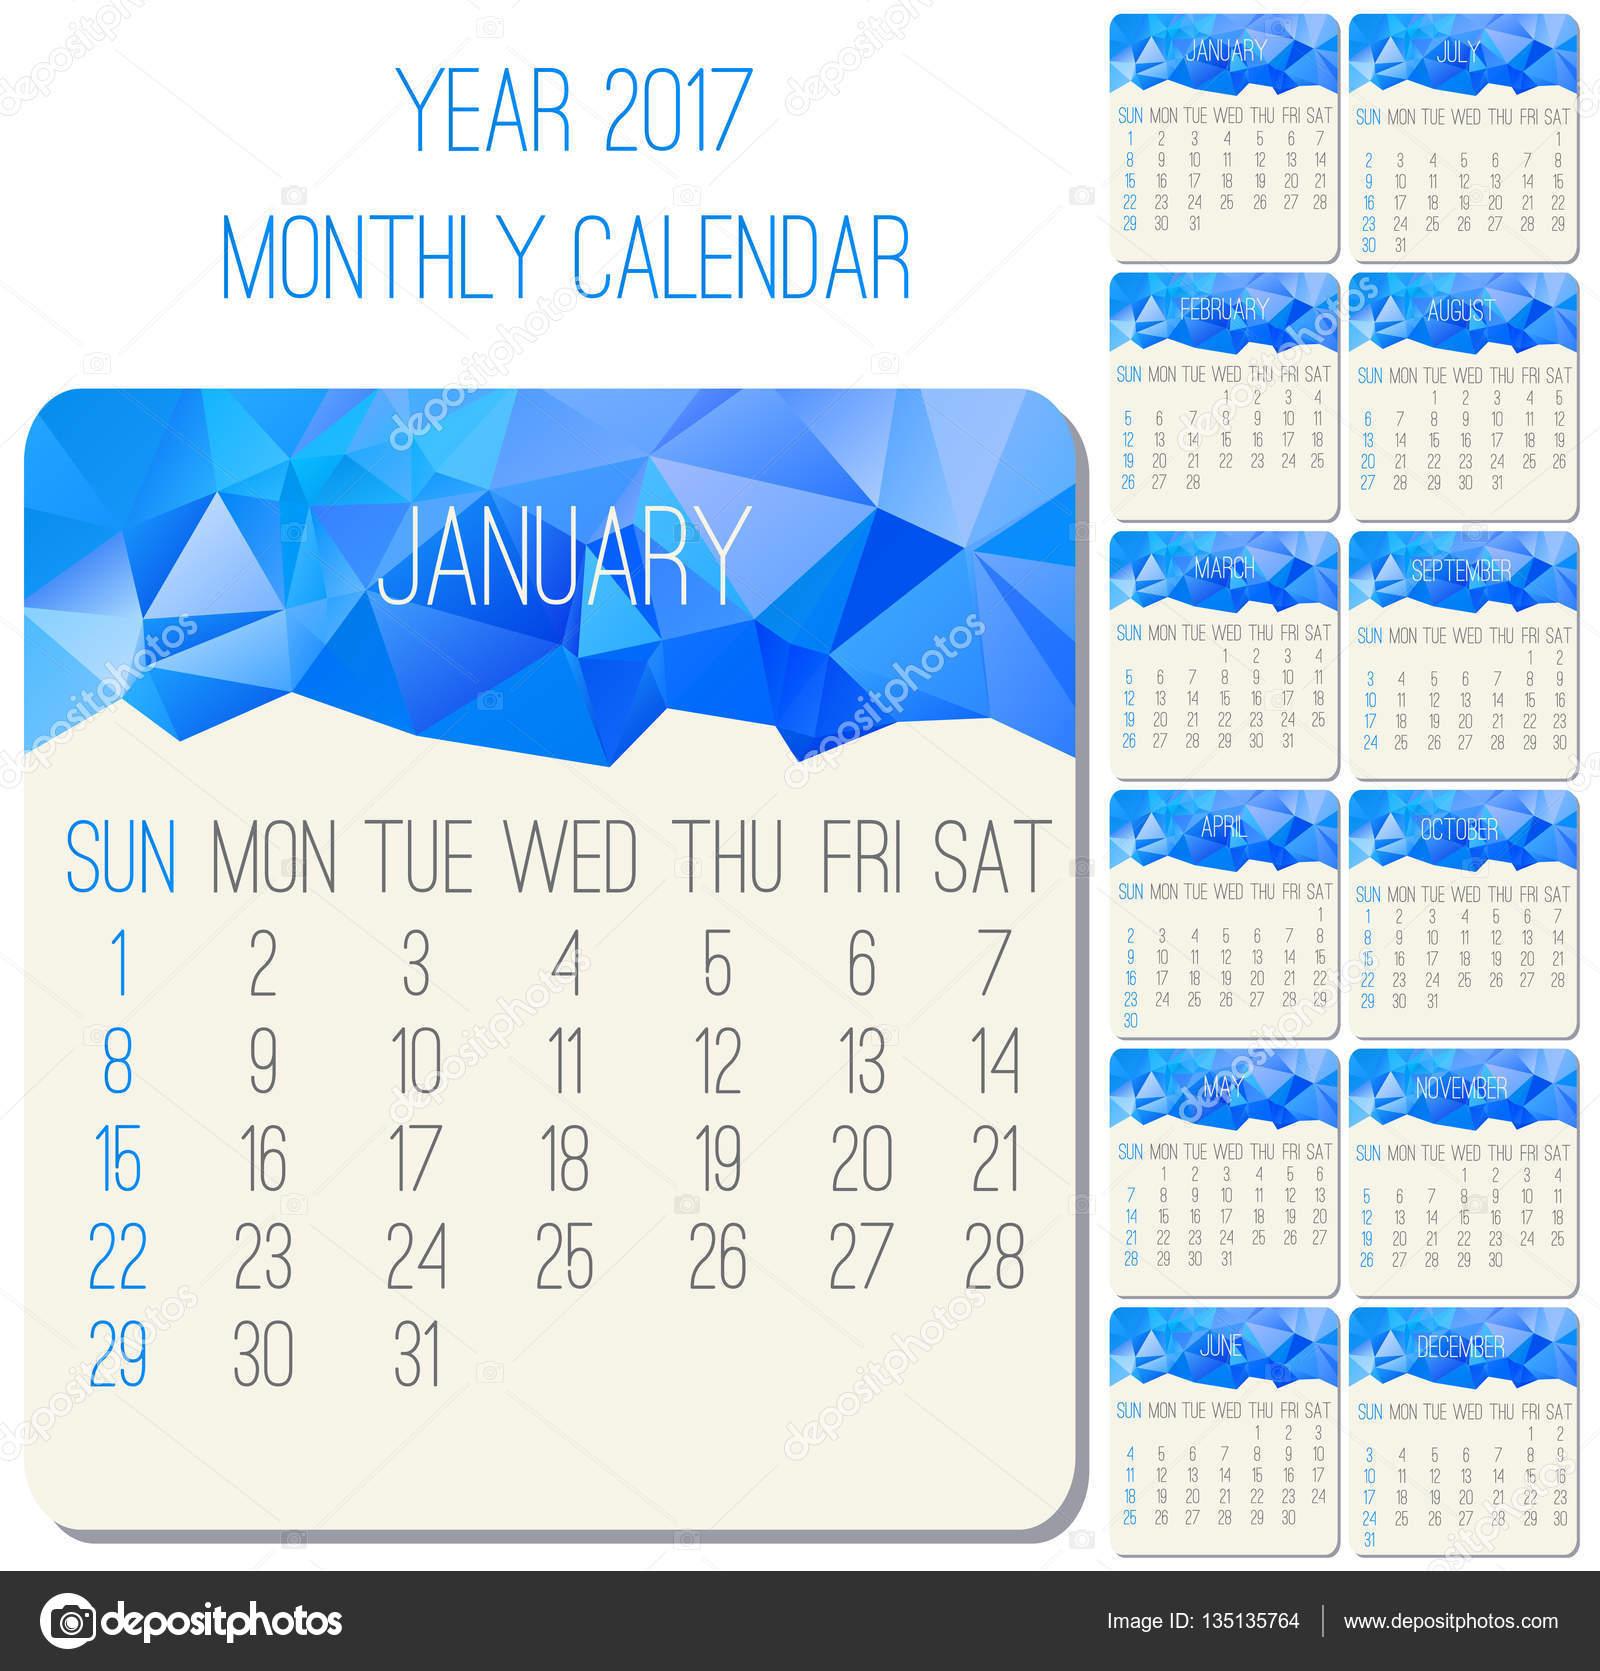 Calendario Anno 2017.Calendario Mensile Anno 2017 Vettoriali Stock C De Kay